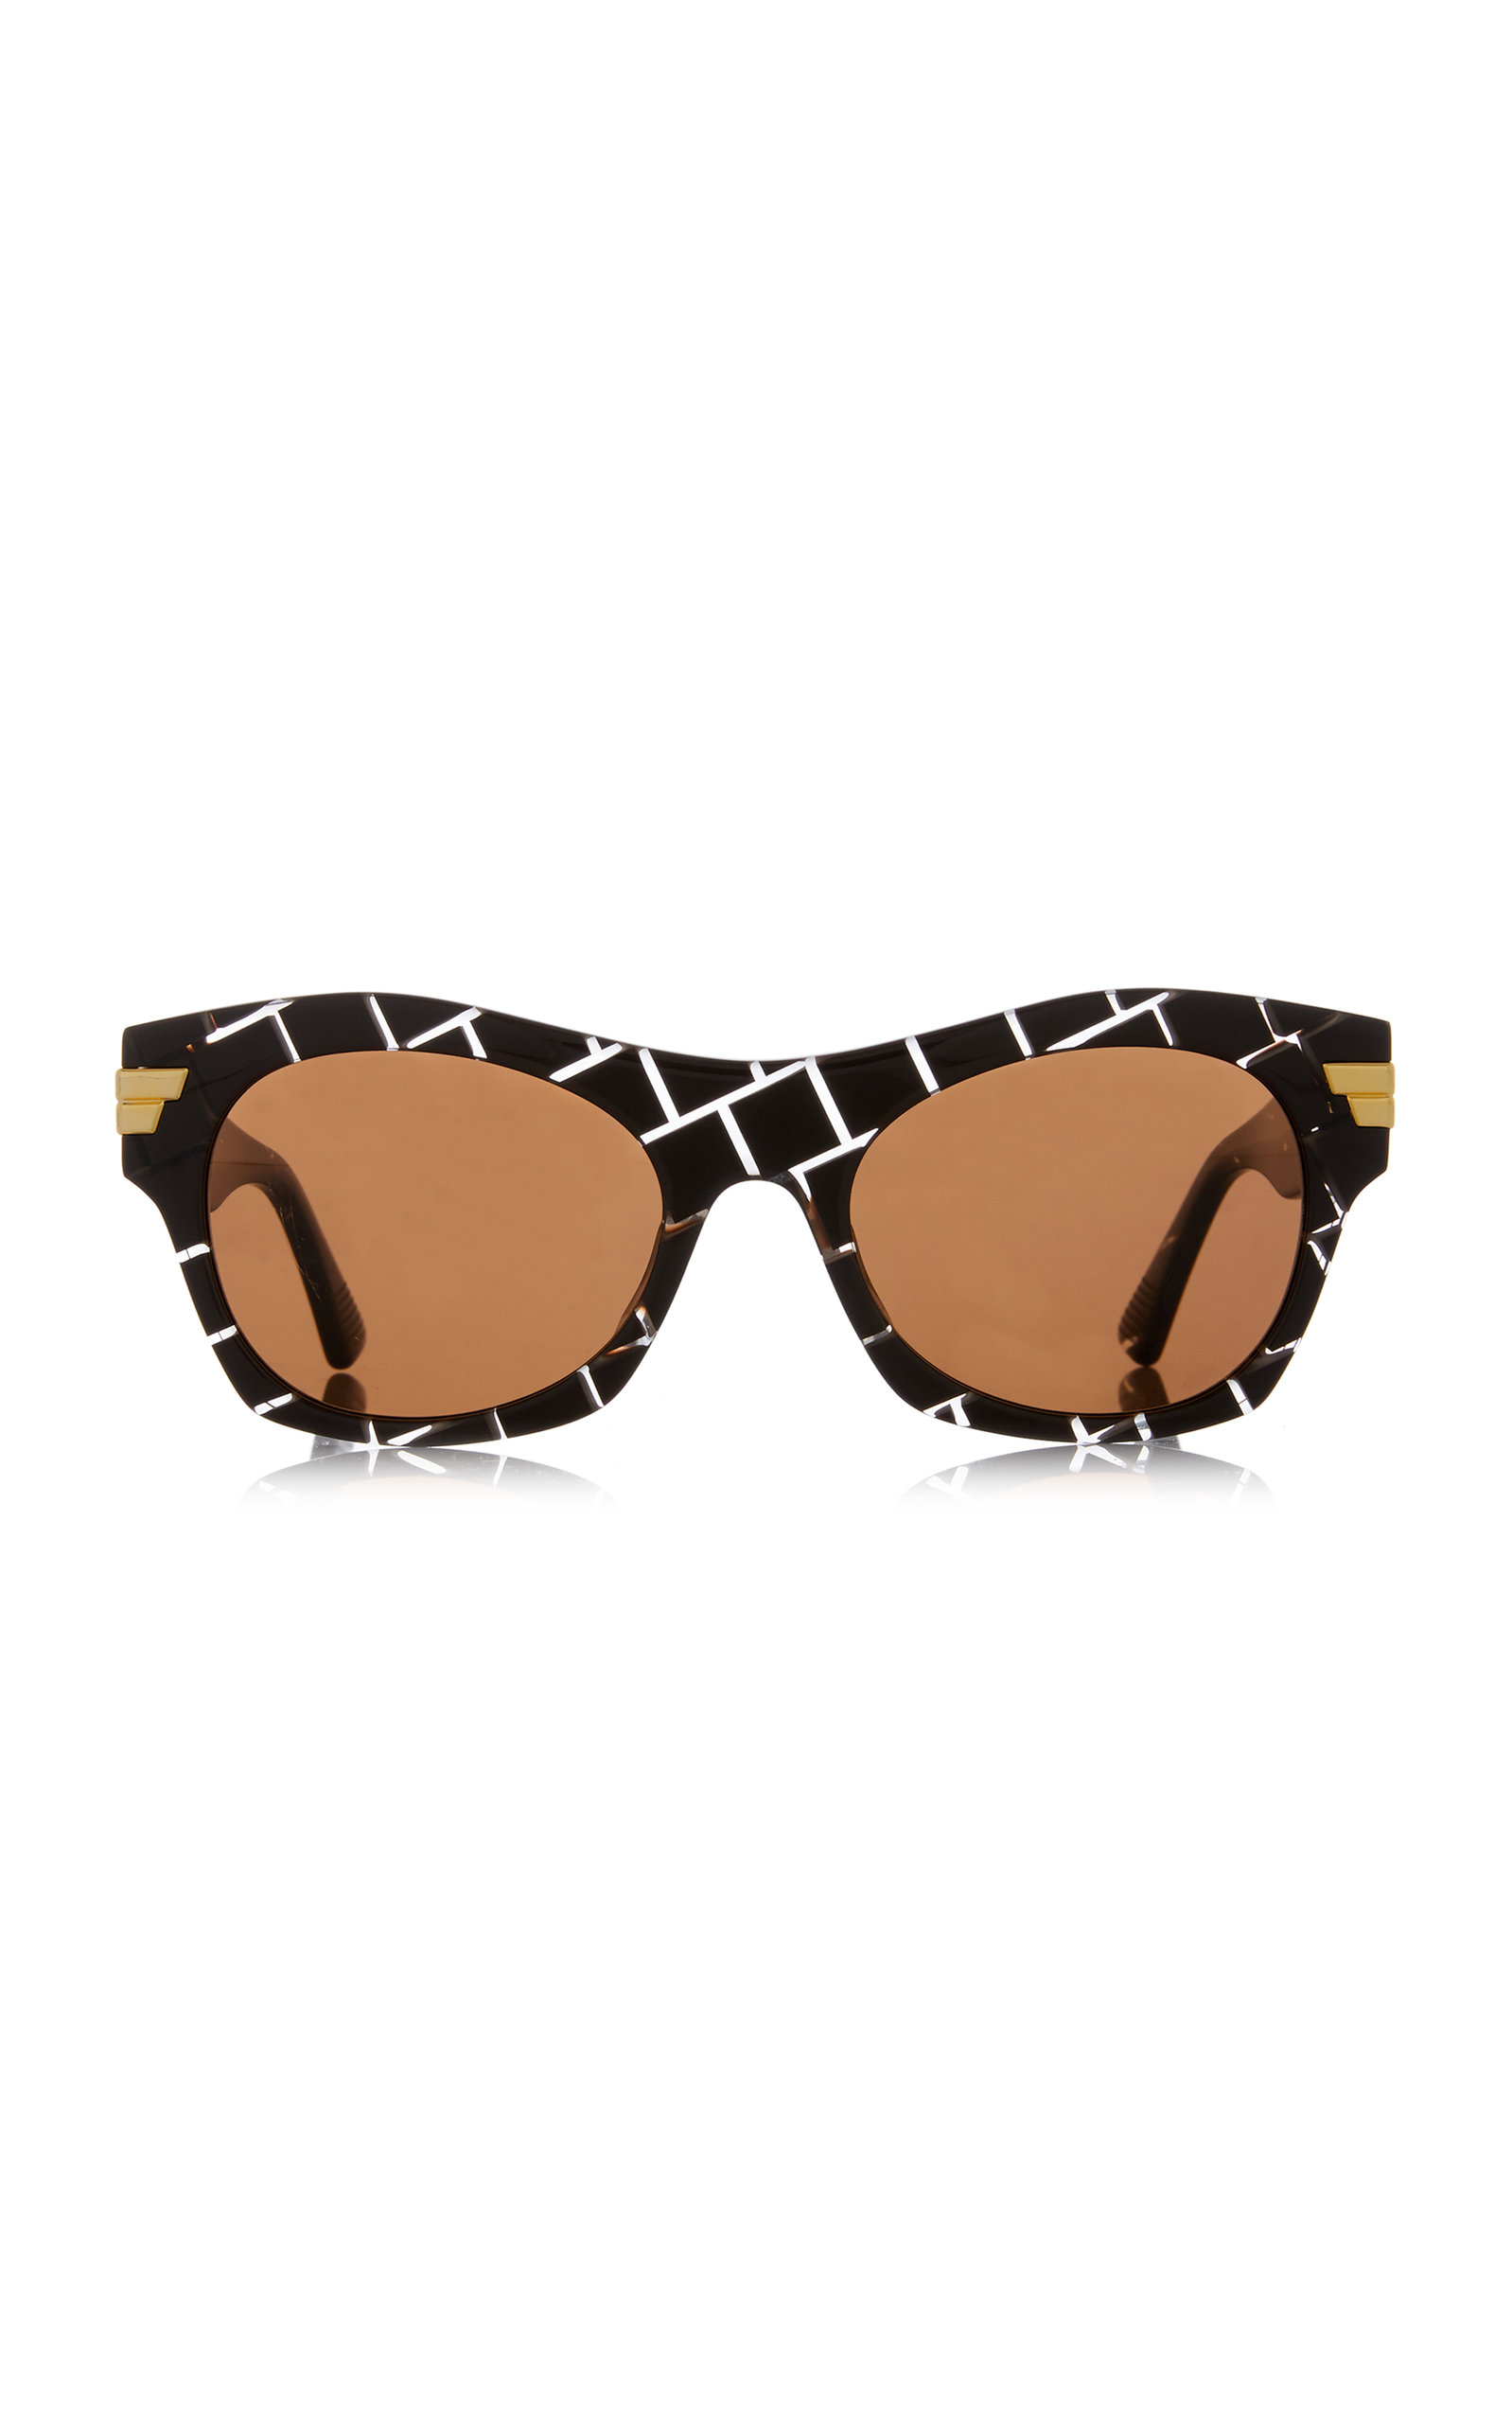 Bottega Veneta - Women's Square-Frame Intrecciato Acetate Sunglasses - Brown - Moda Operandi